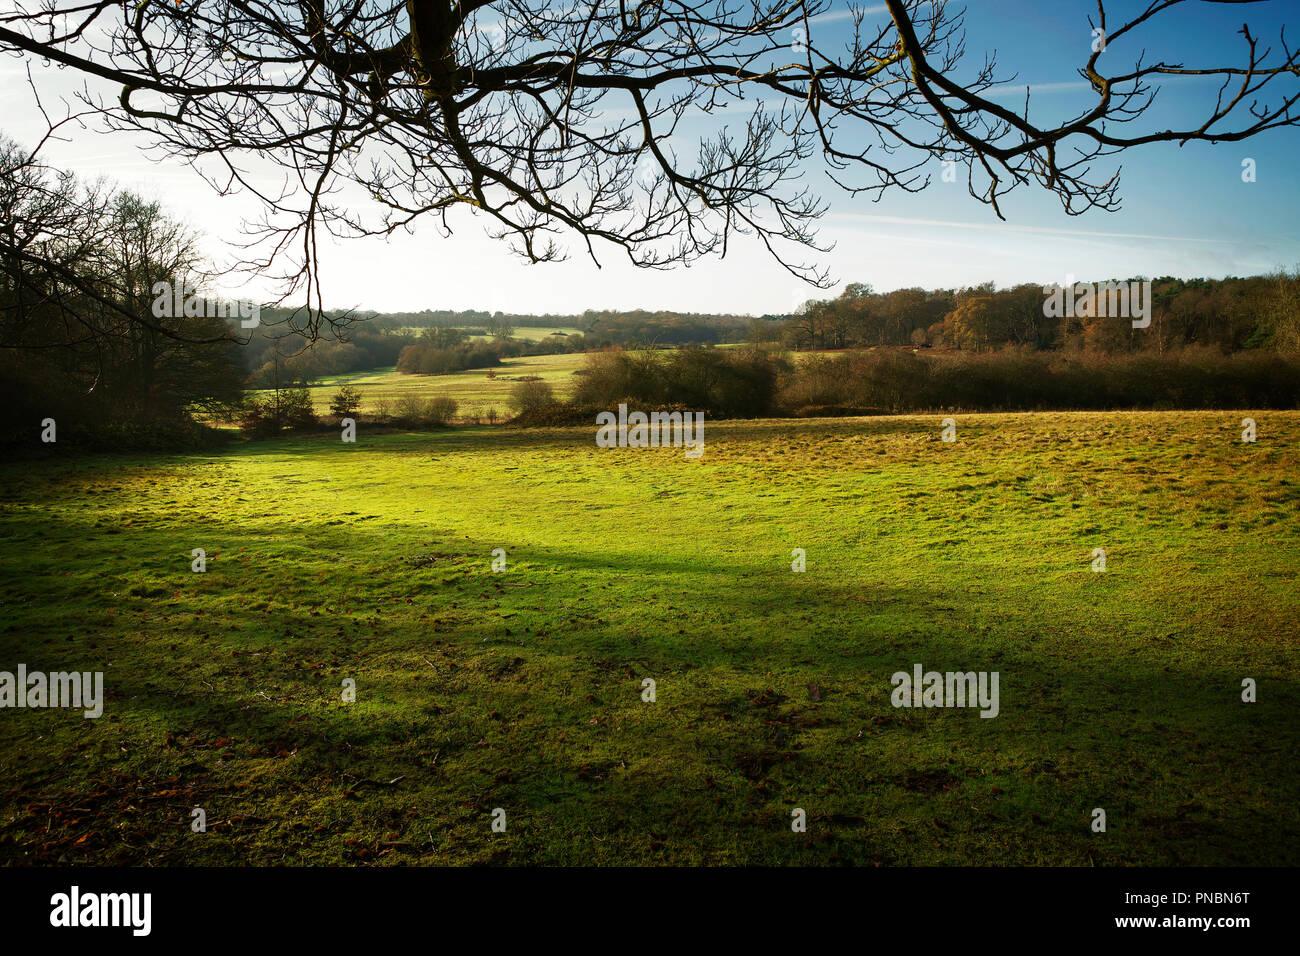 Autumn view of Trent Park, London UK. - Stock Image